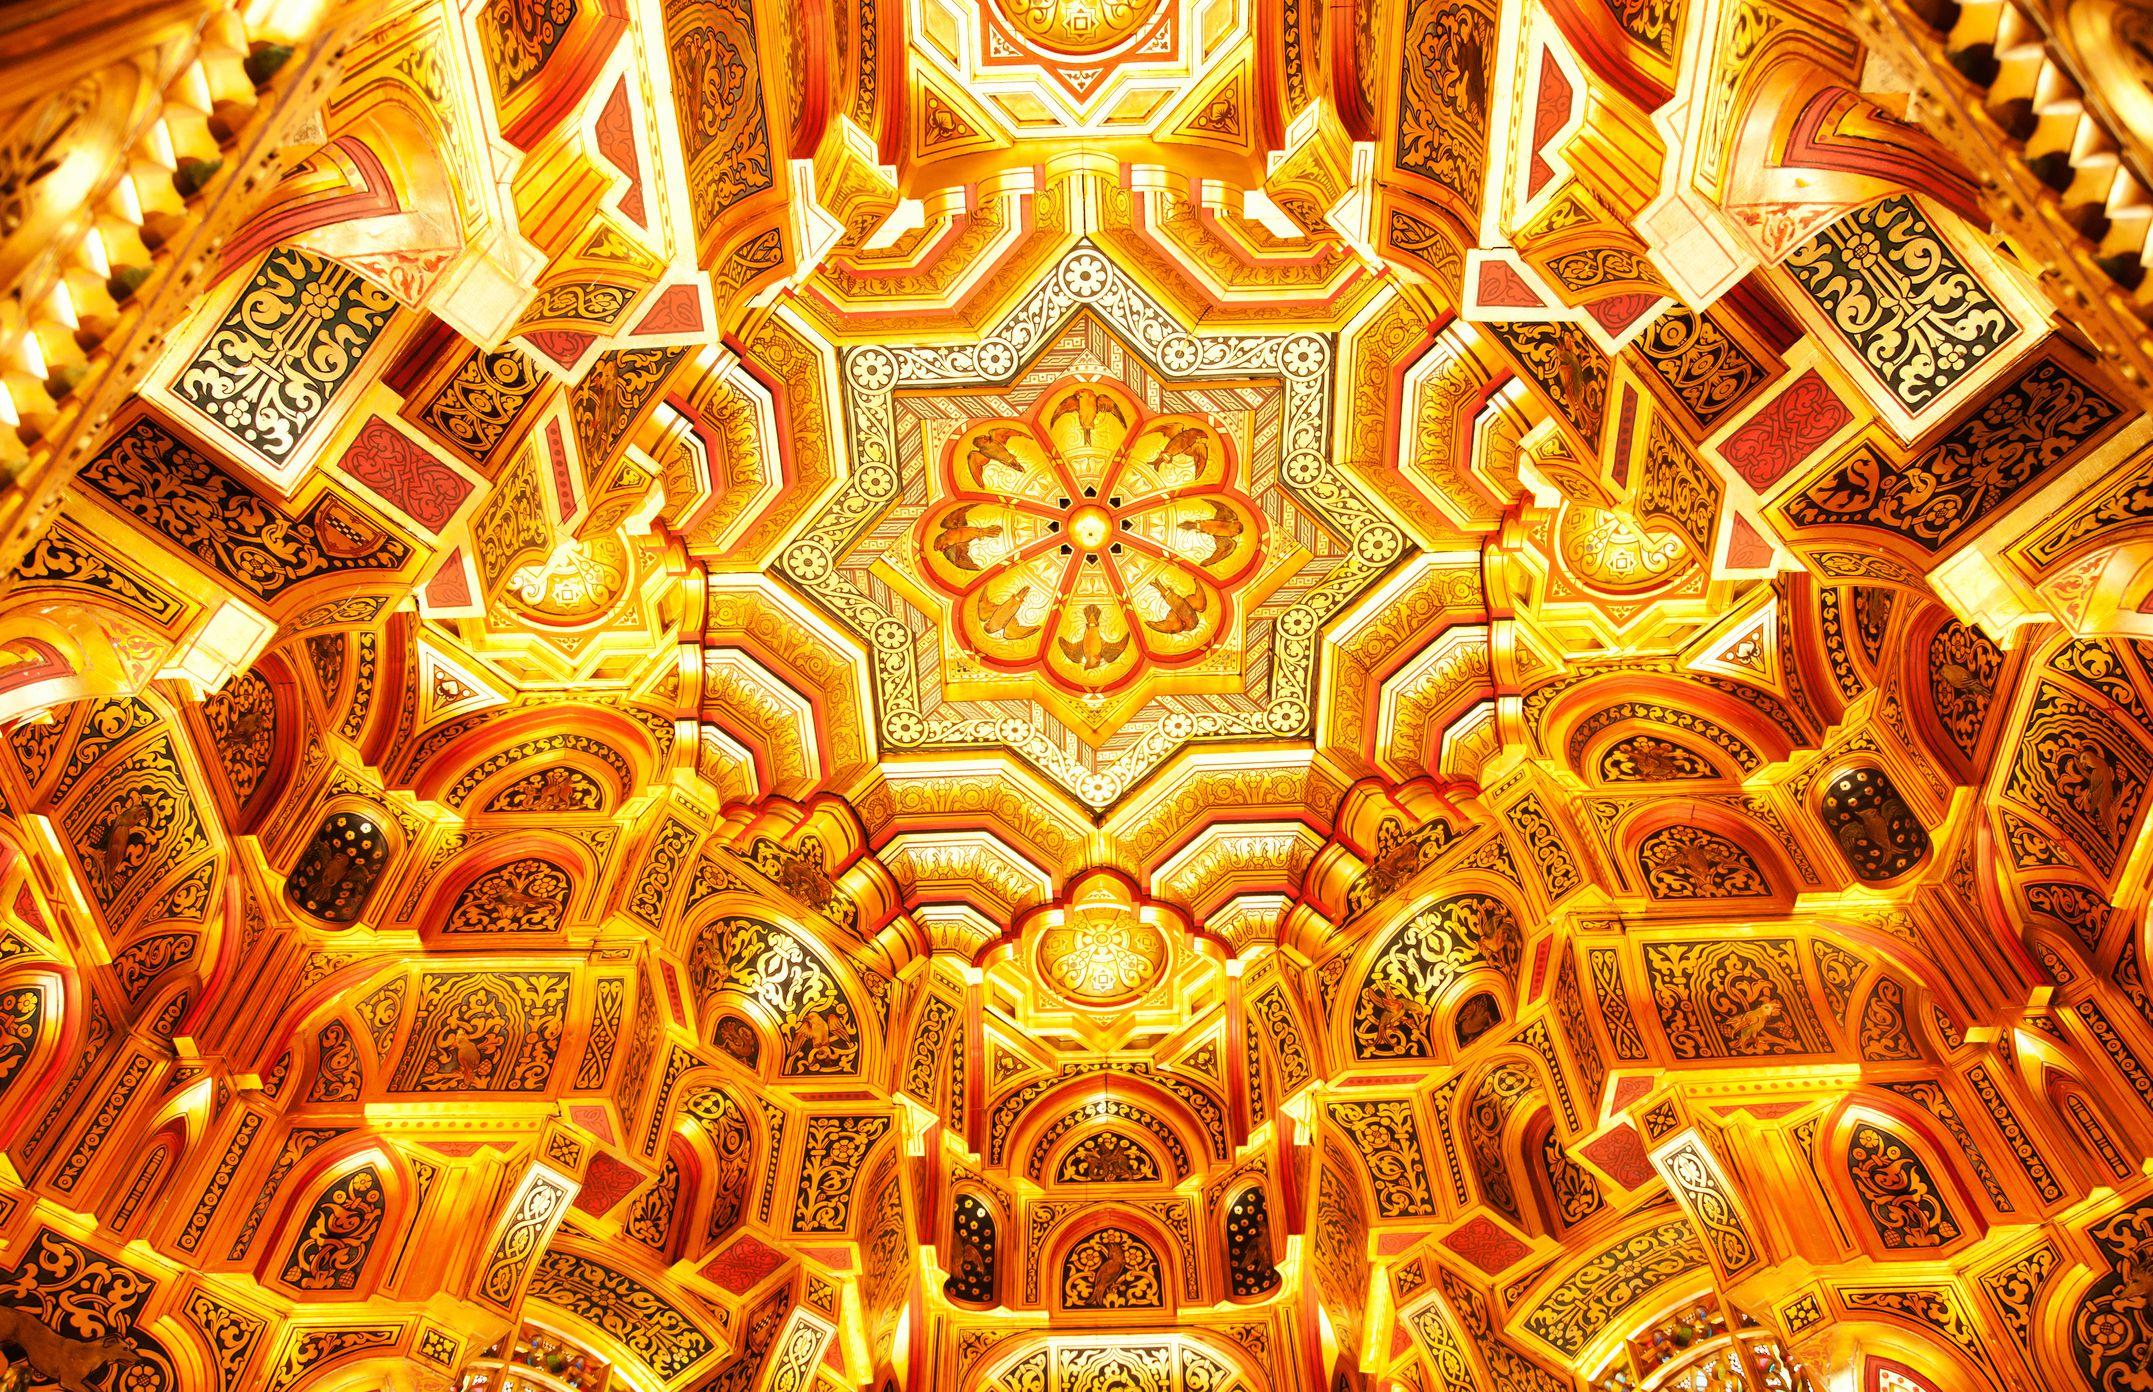 Cardiff Castle Arab Room Ceiling, Wales